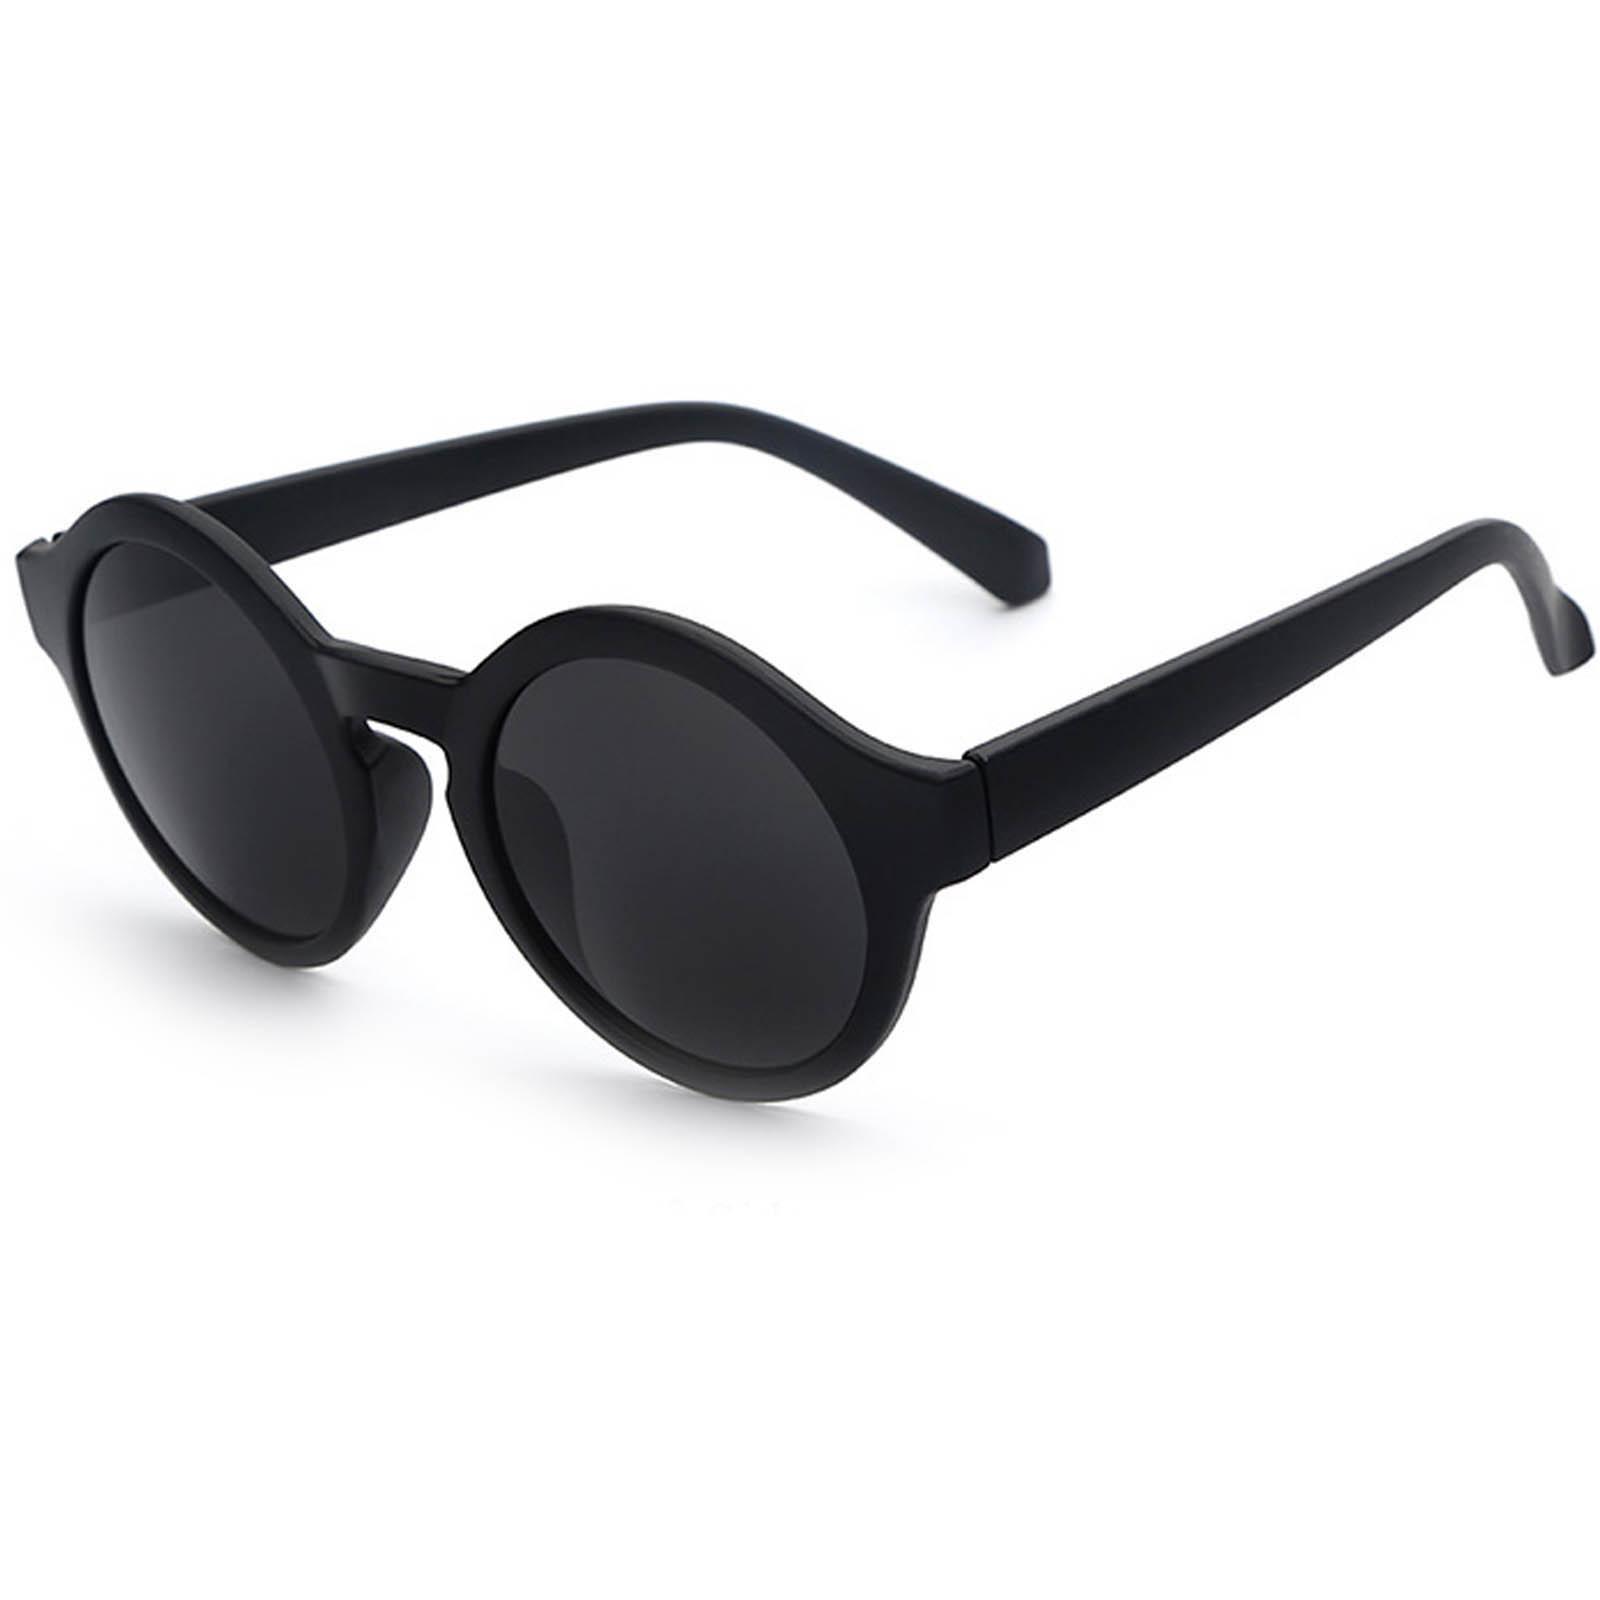 OWL ® 010 C5 Round Eyewear Sunglasses Women's Men's Plastic Round Circle Matte Black Frame Black Lens One Pair